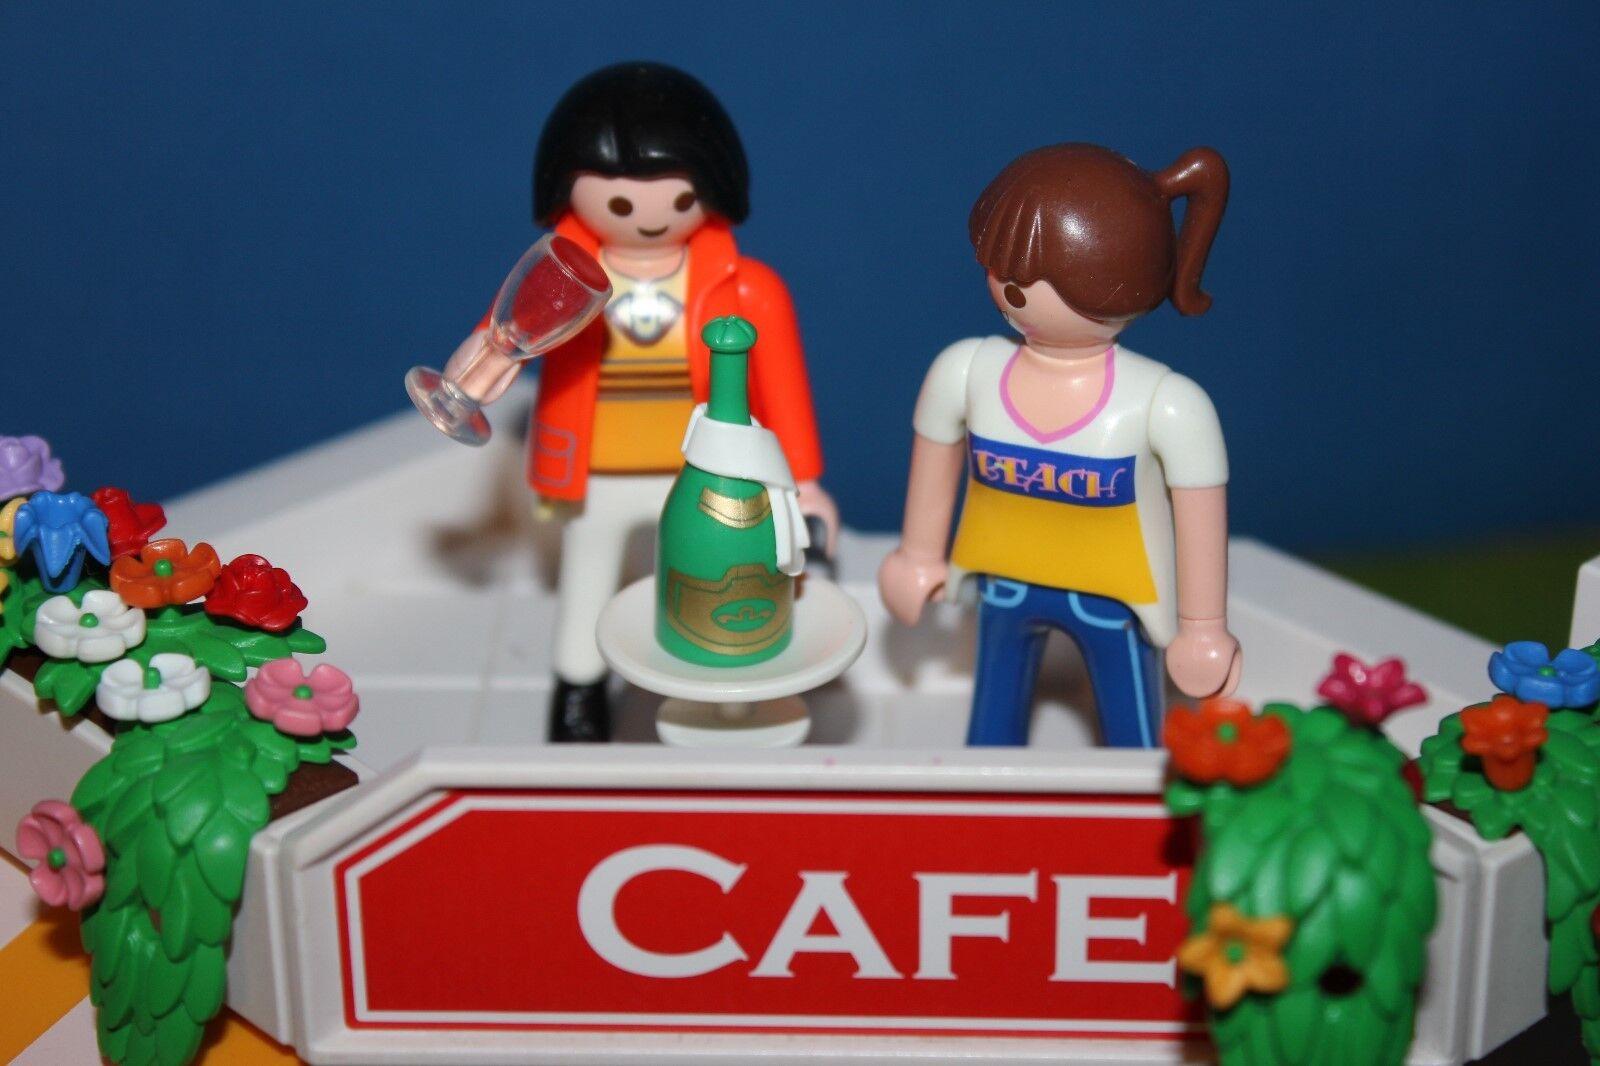 Playmobil Citywelt Citywelt Citywelt Set Personaggi 110   Cafe   b2dfc4